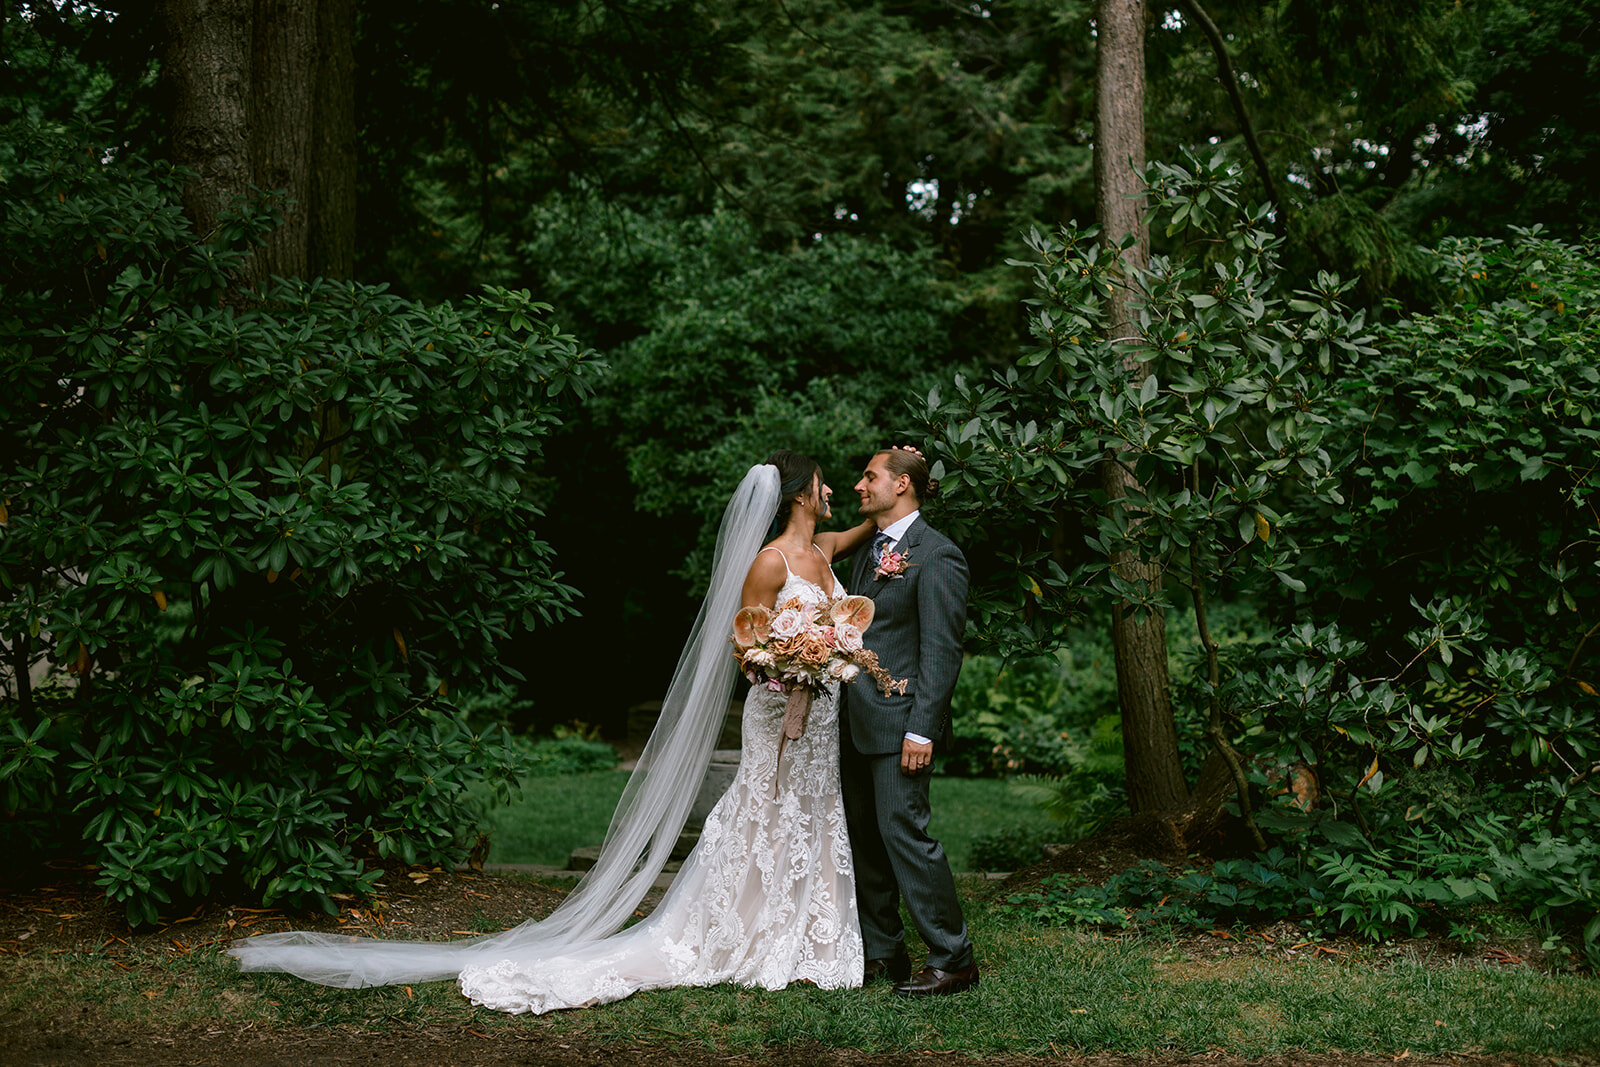 kera-anthony-wedding-previews-62.jpg